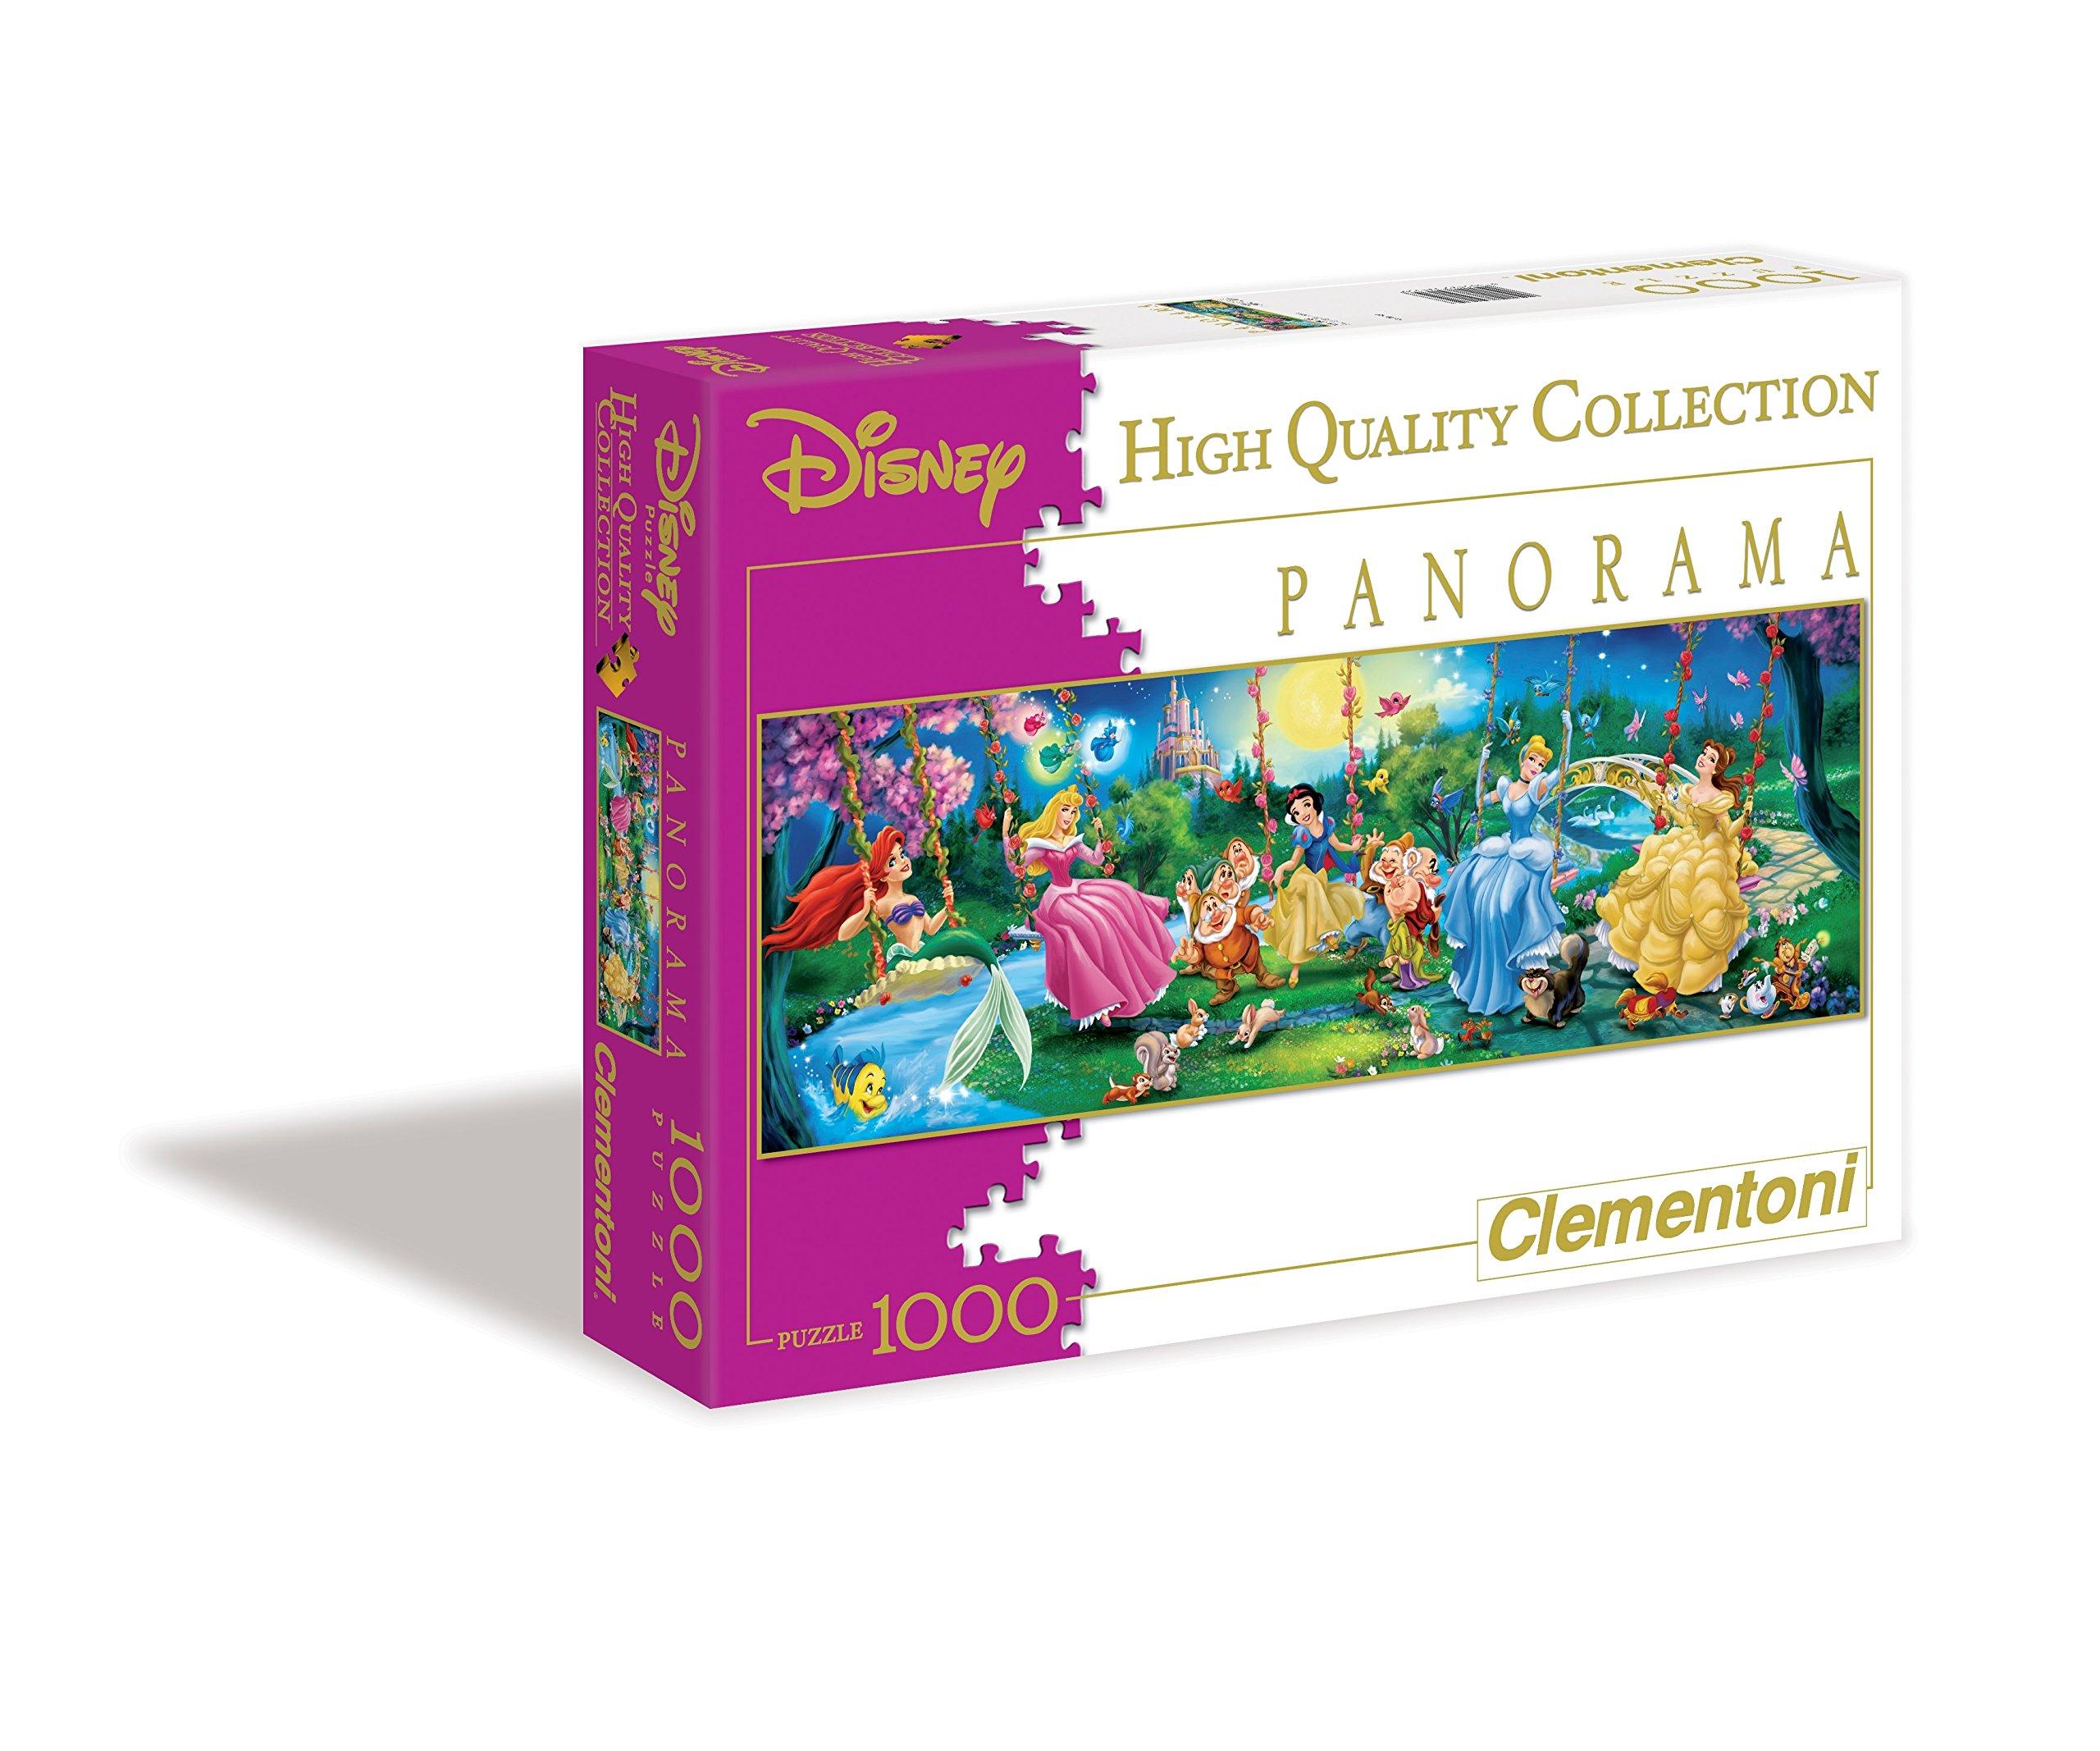 Clementoni 39449 Disney Panorama Collection Clementoni-39449-Disney Panorama Collection-Mickey /& Minnie-1000 Pieces Multi-Colour